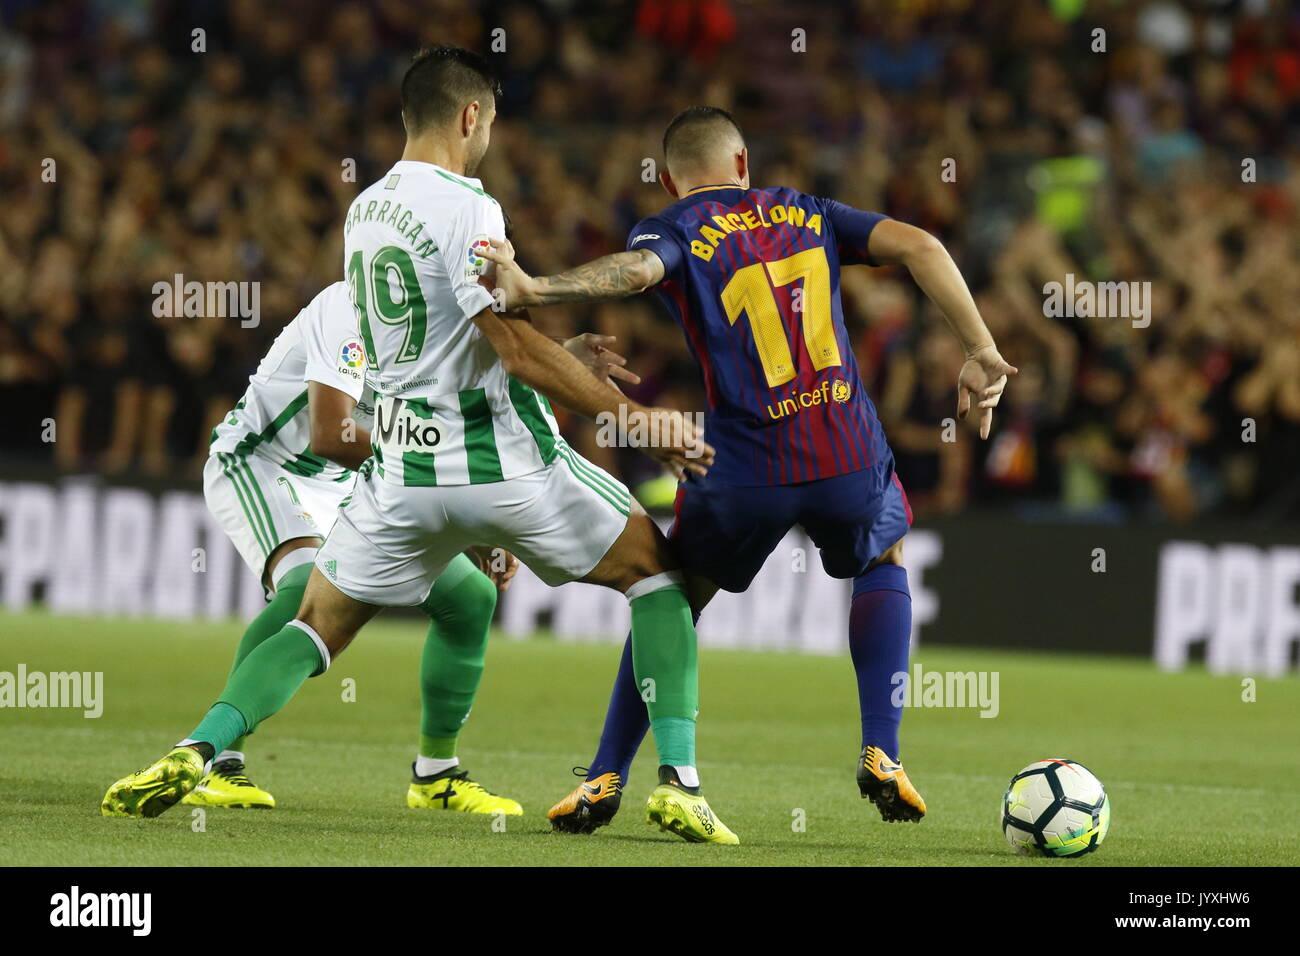 Paco Alcacer in action during La Liga game between FC Barcelona v Betis at Camp Nou - Stock Image